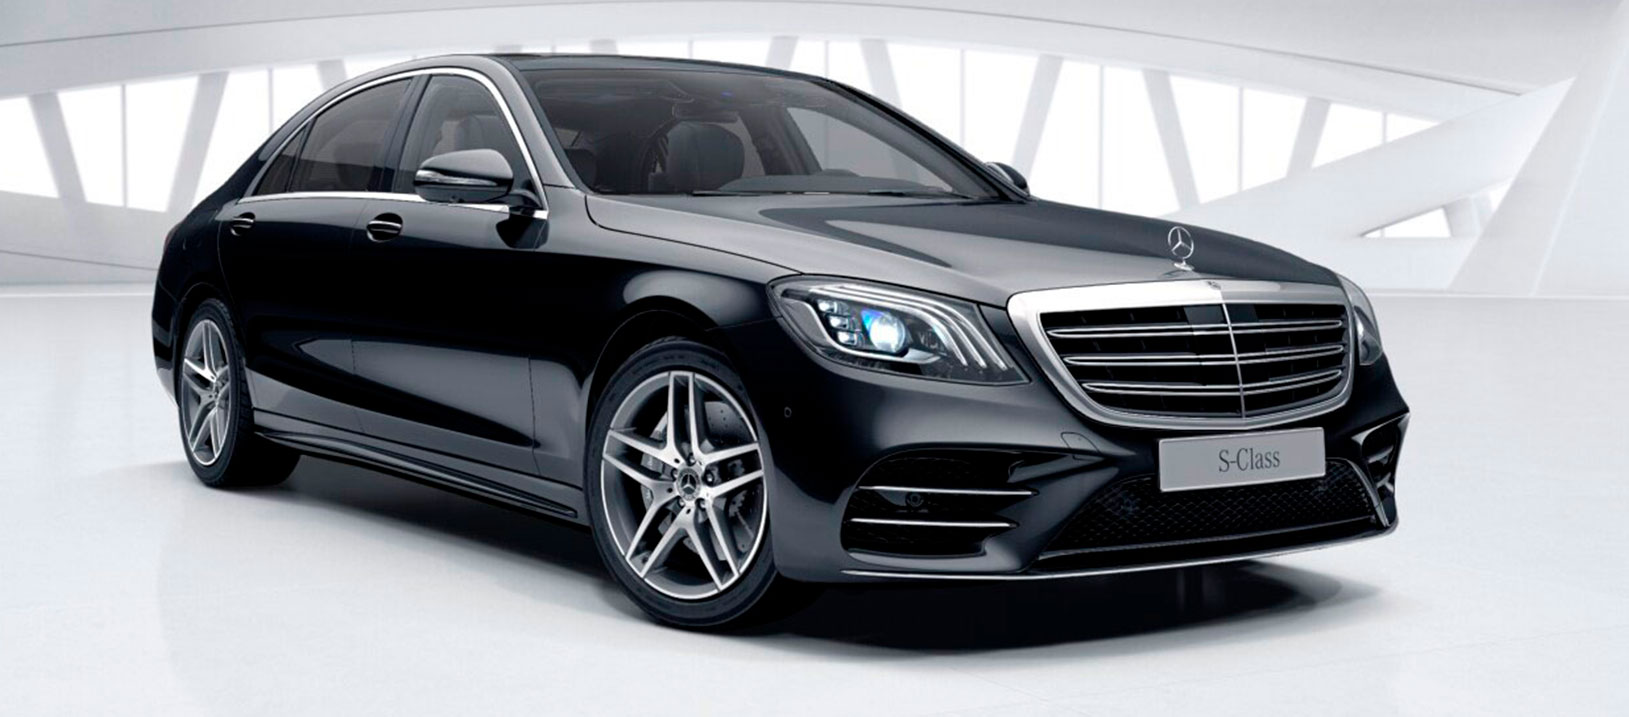 Mercedes-Benz S 400 d 4MATIC long 52600207